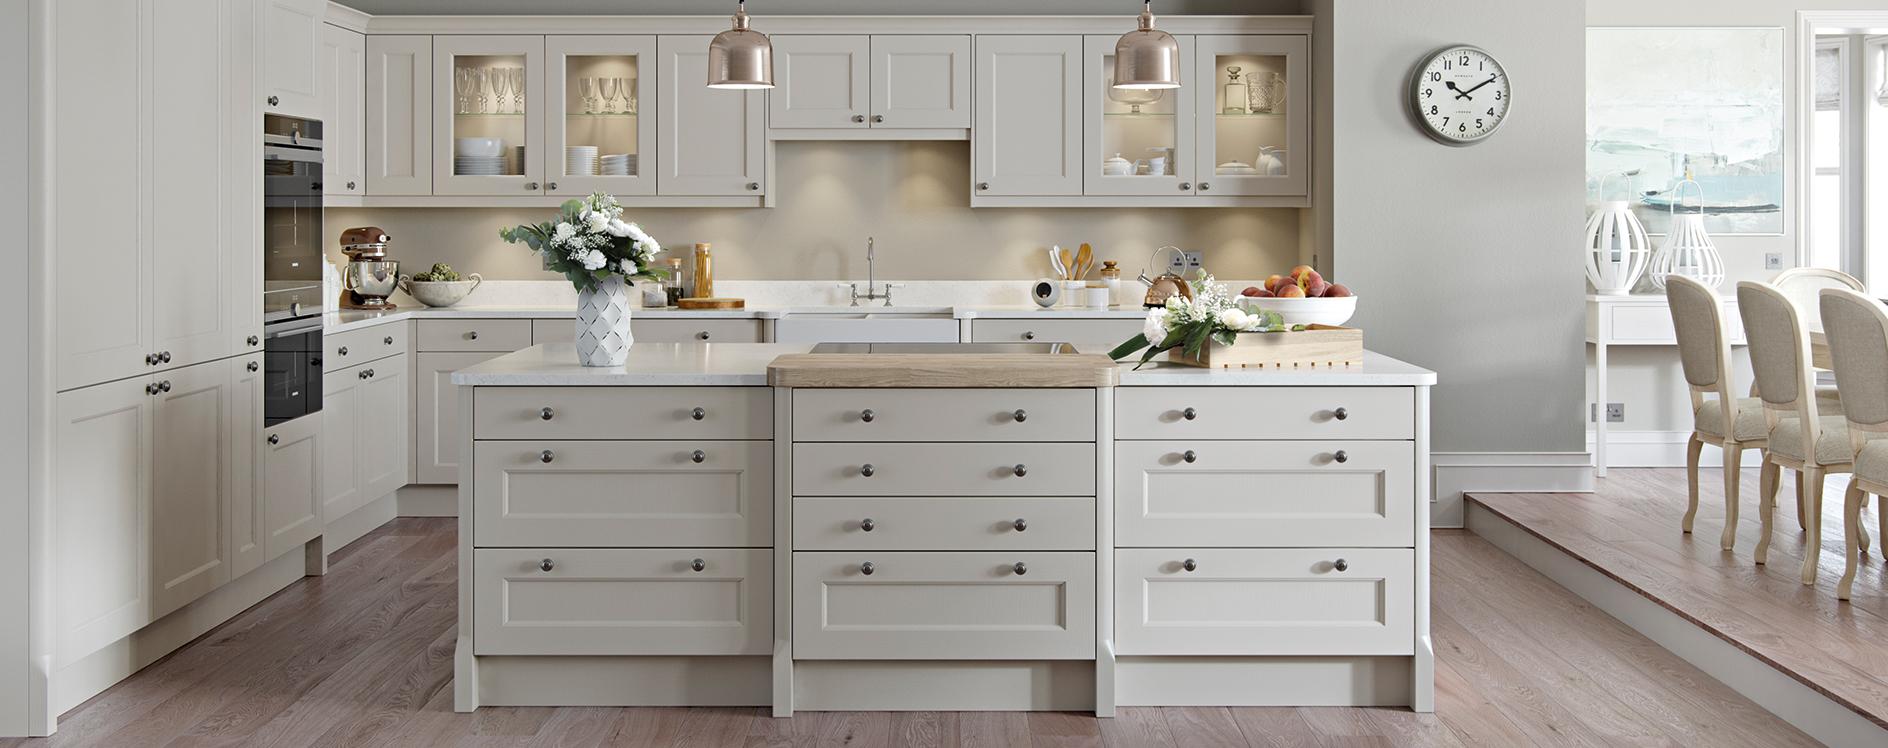 Burbidge Finsbury Painted Timber Kitchen